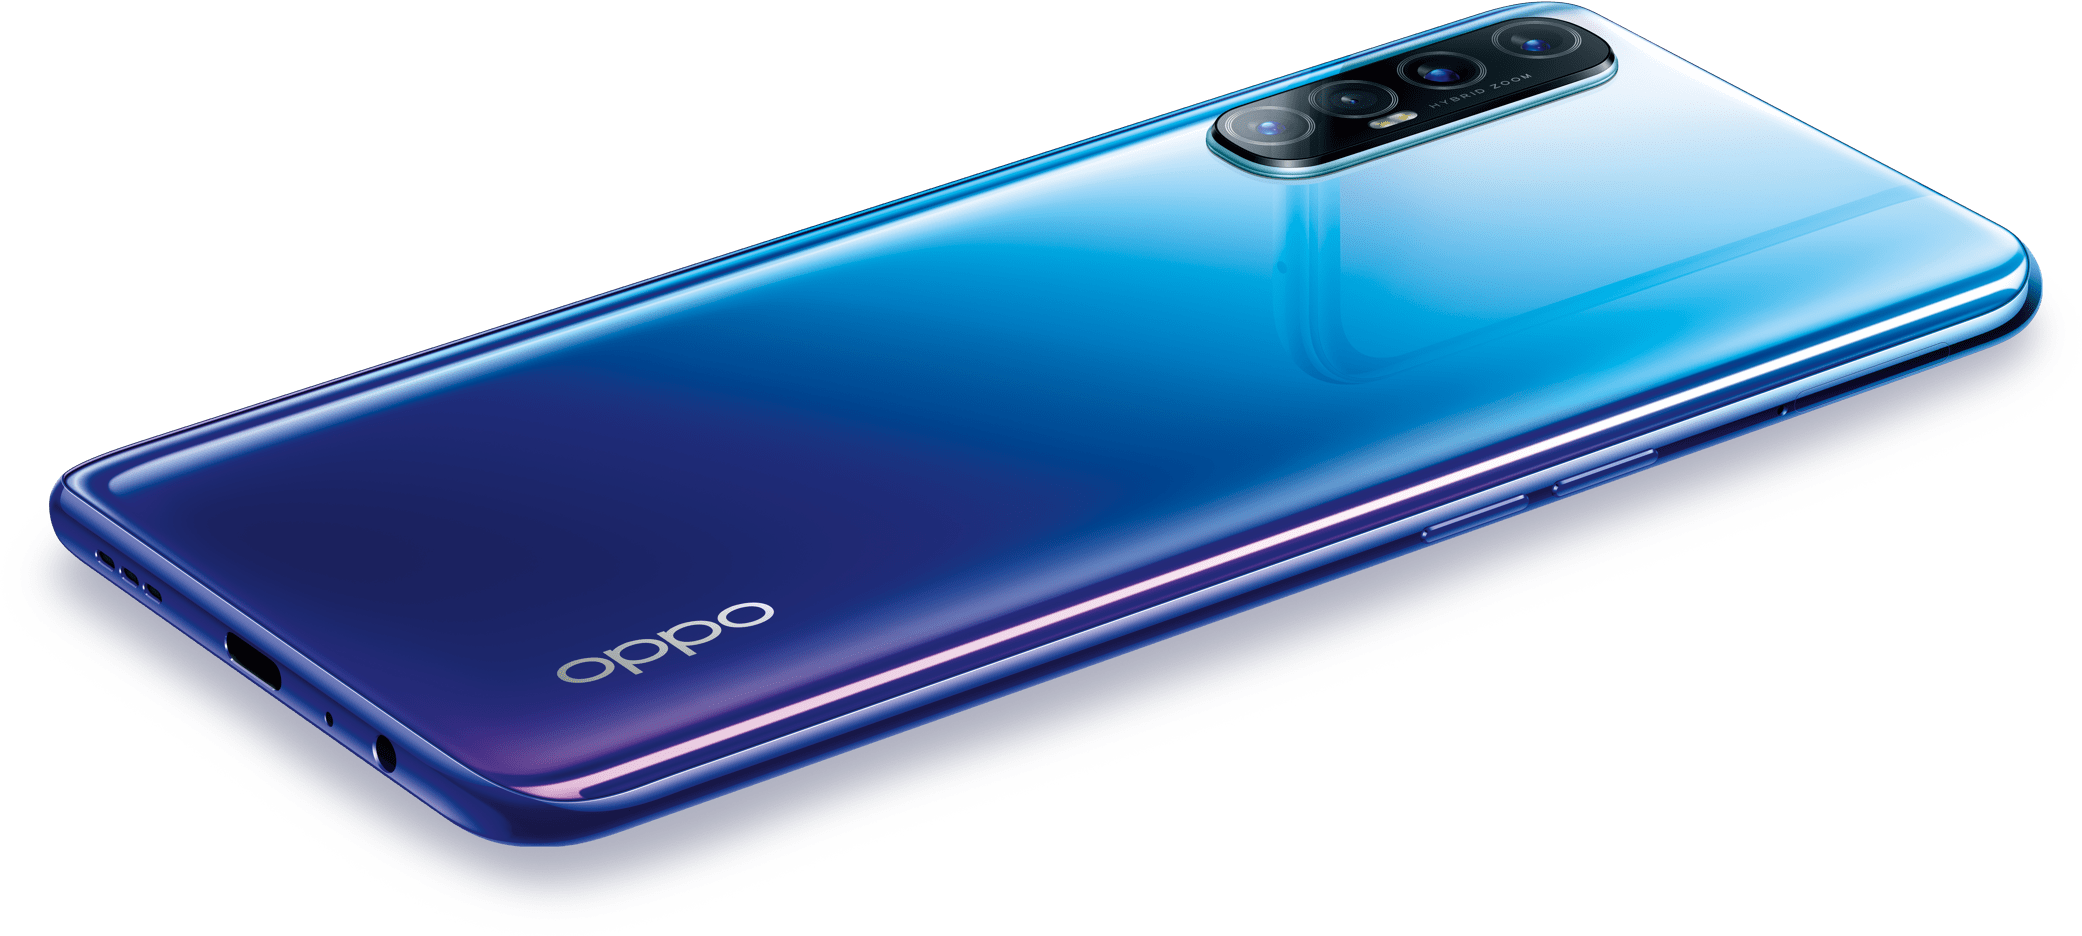 OPPO Reno 3 系列马来西亚正式发布,售价 RM1699 起,赠送价值 RM239 Enco W31 无线耳机 9